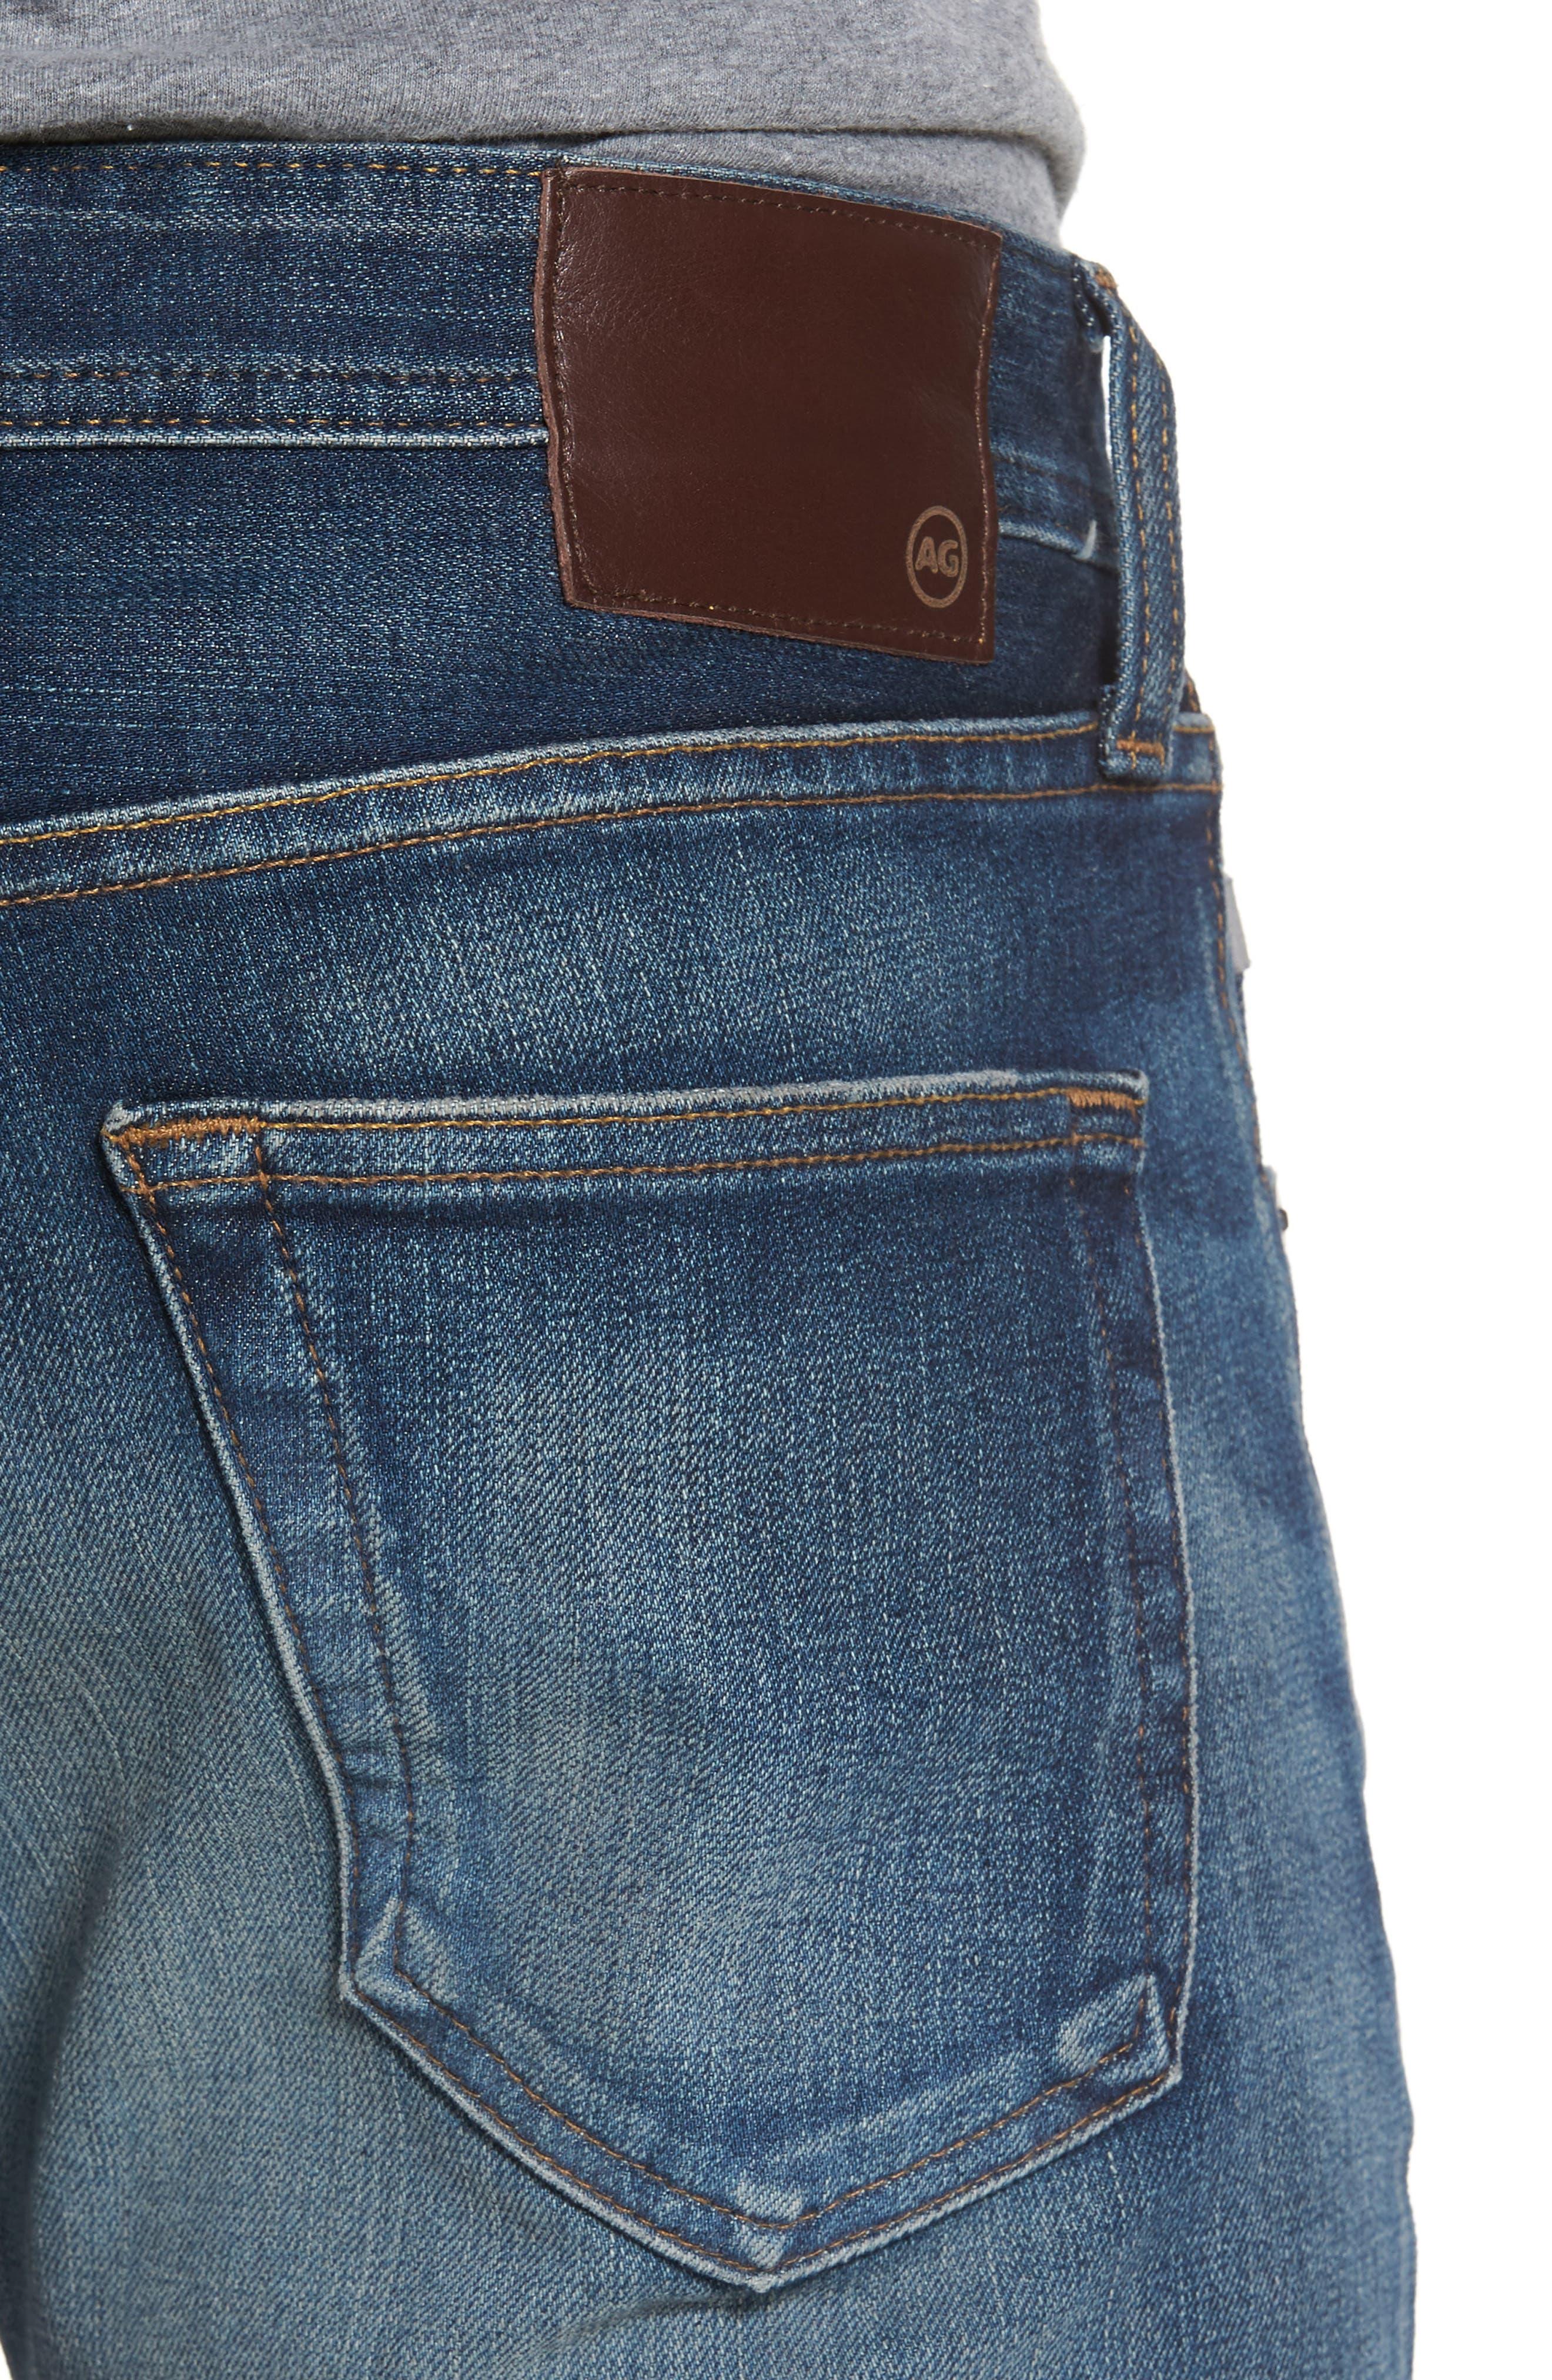 Tellis Slim Fit Jeans,                             Alternate thumbnail 4, color,                             496